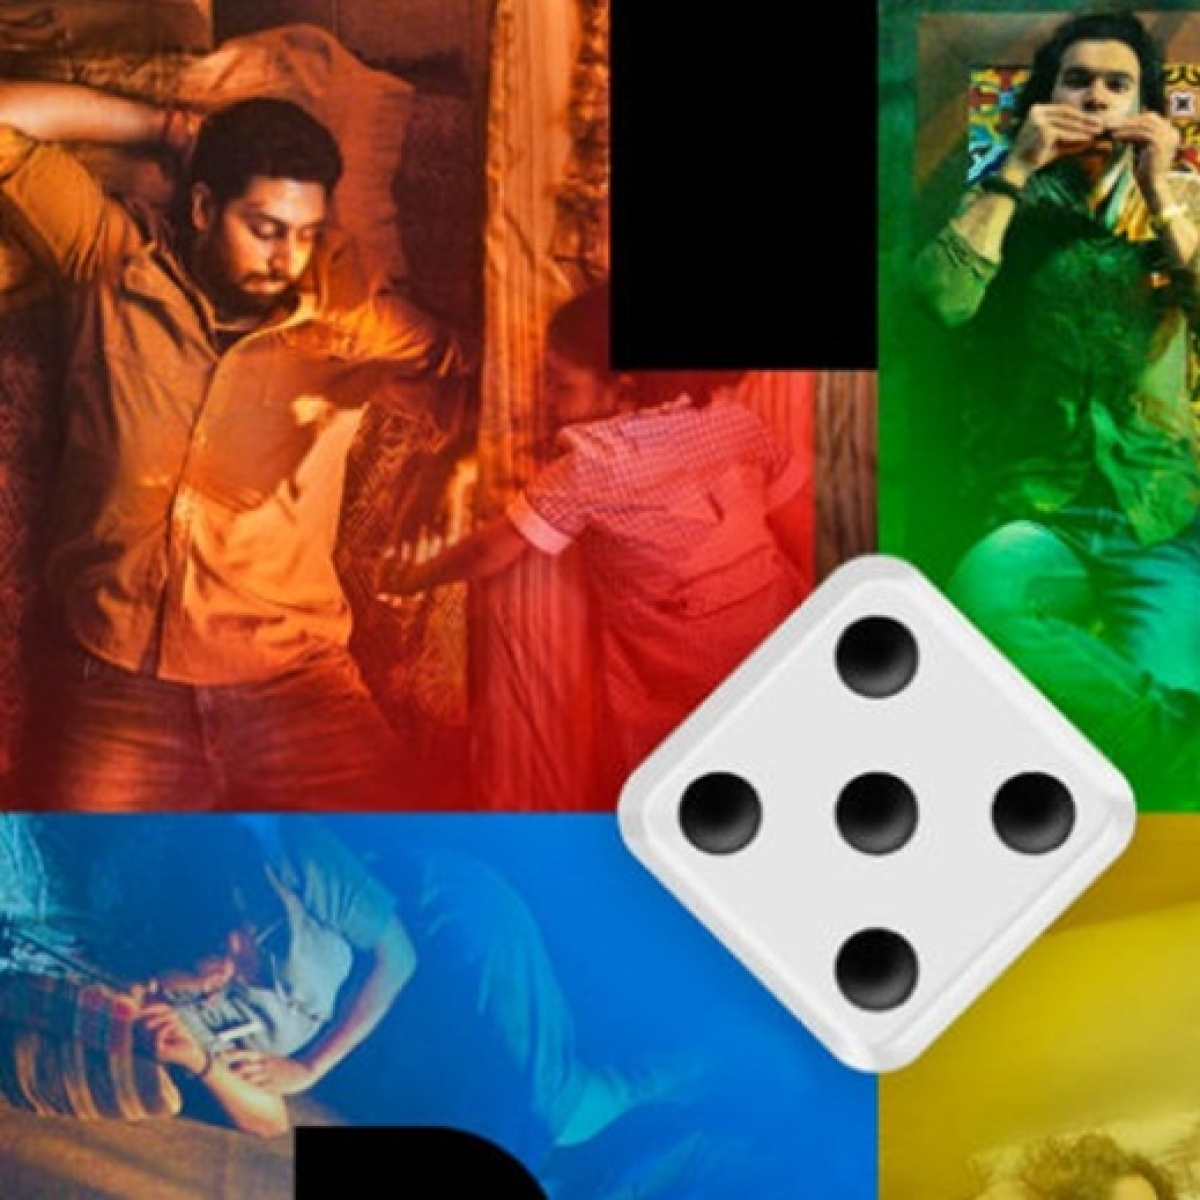 Anurag Basu's 'Ludo' starring Abhishek Bachchan, Aditya Roy Kapur to release on April 24, 2020